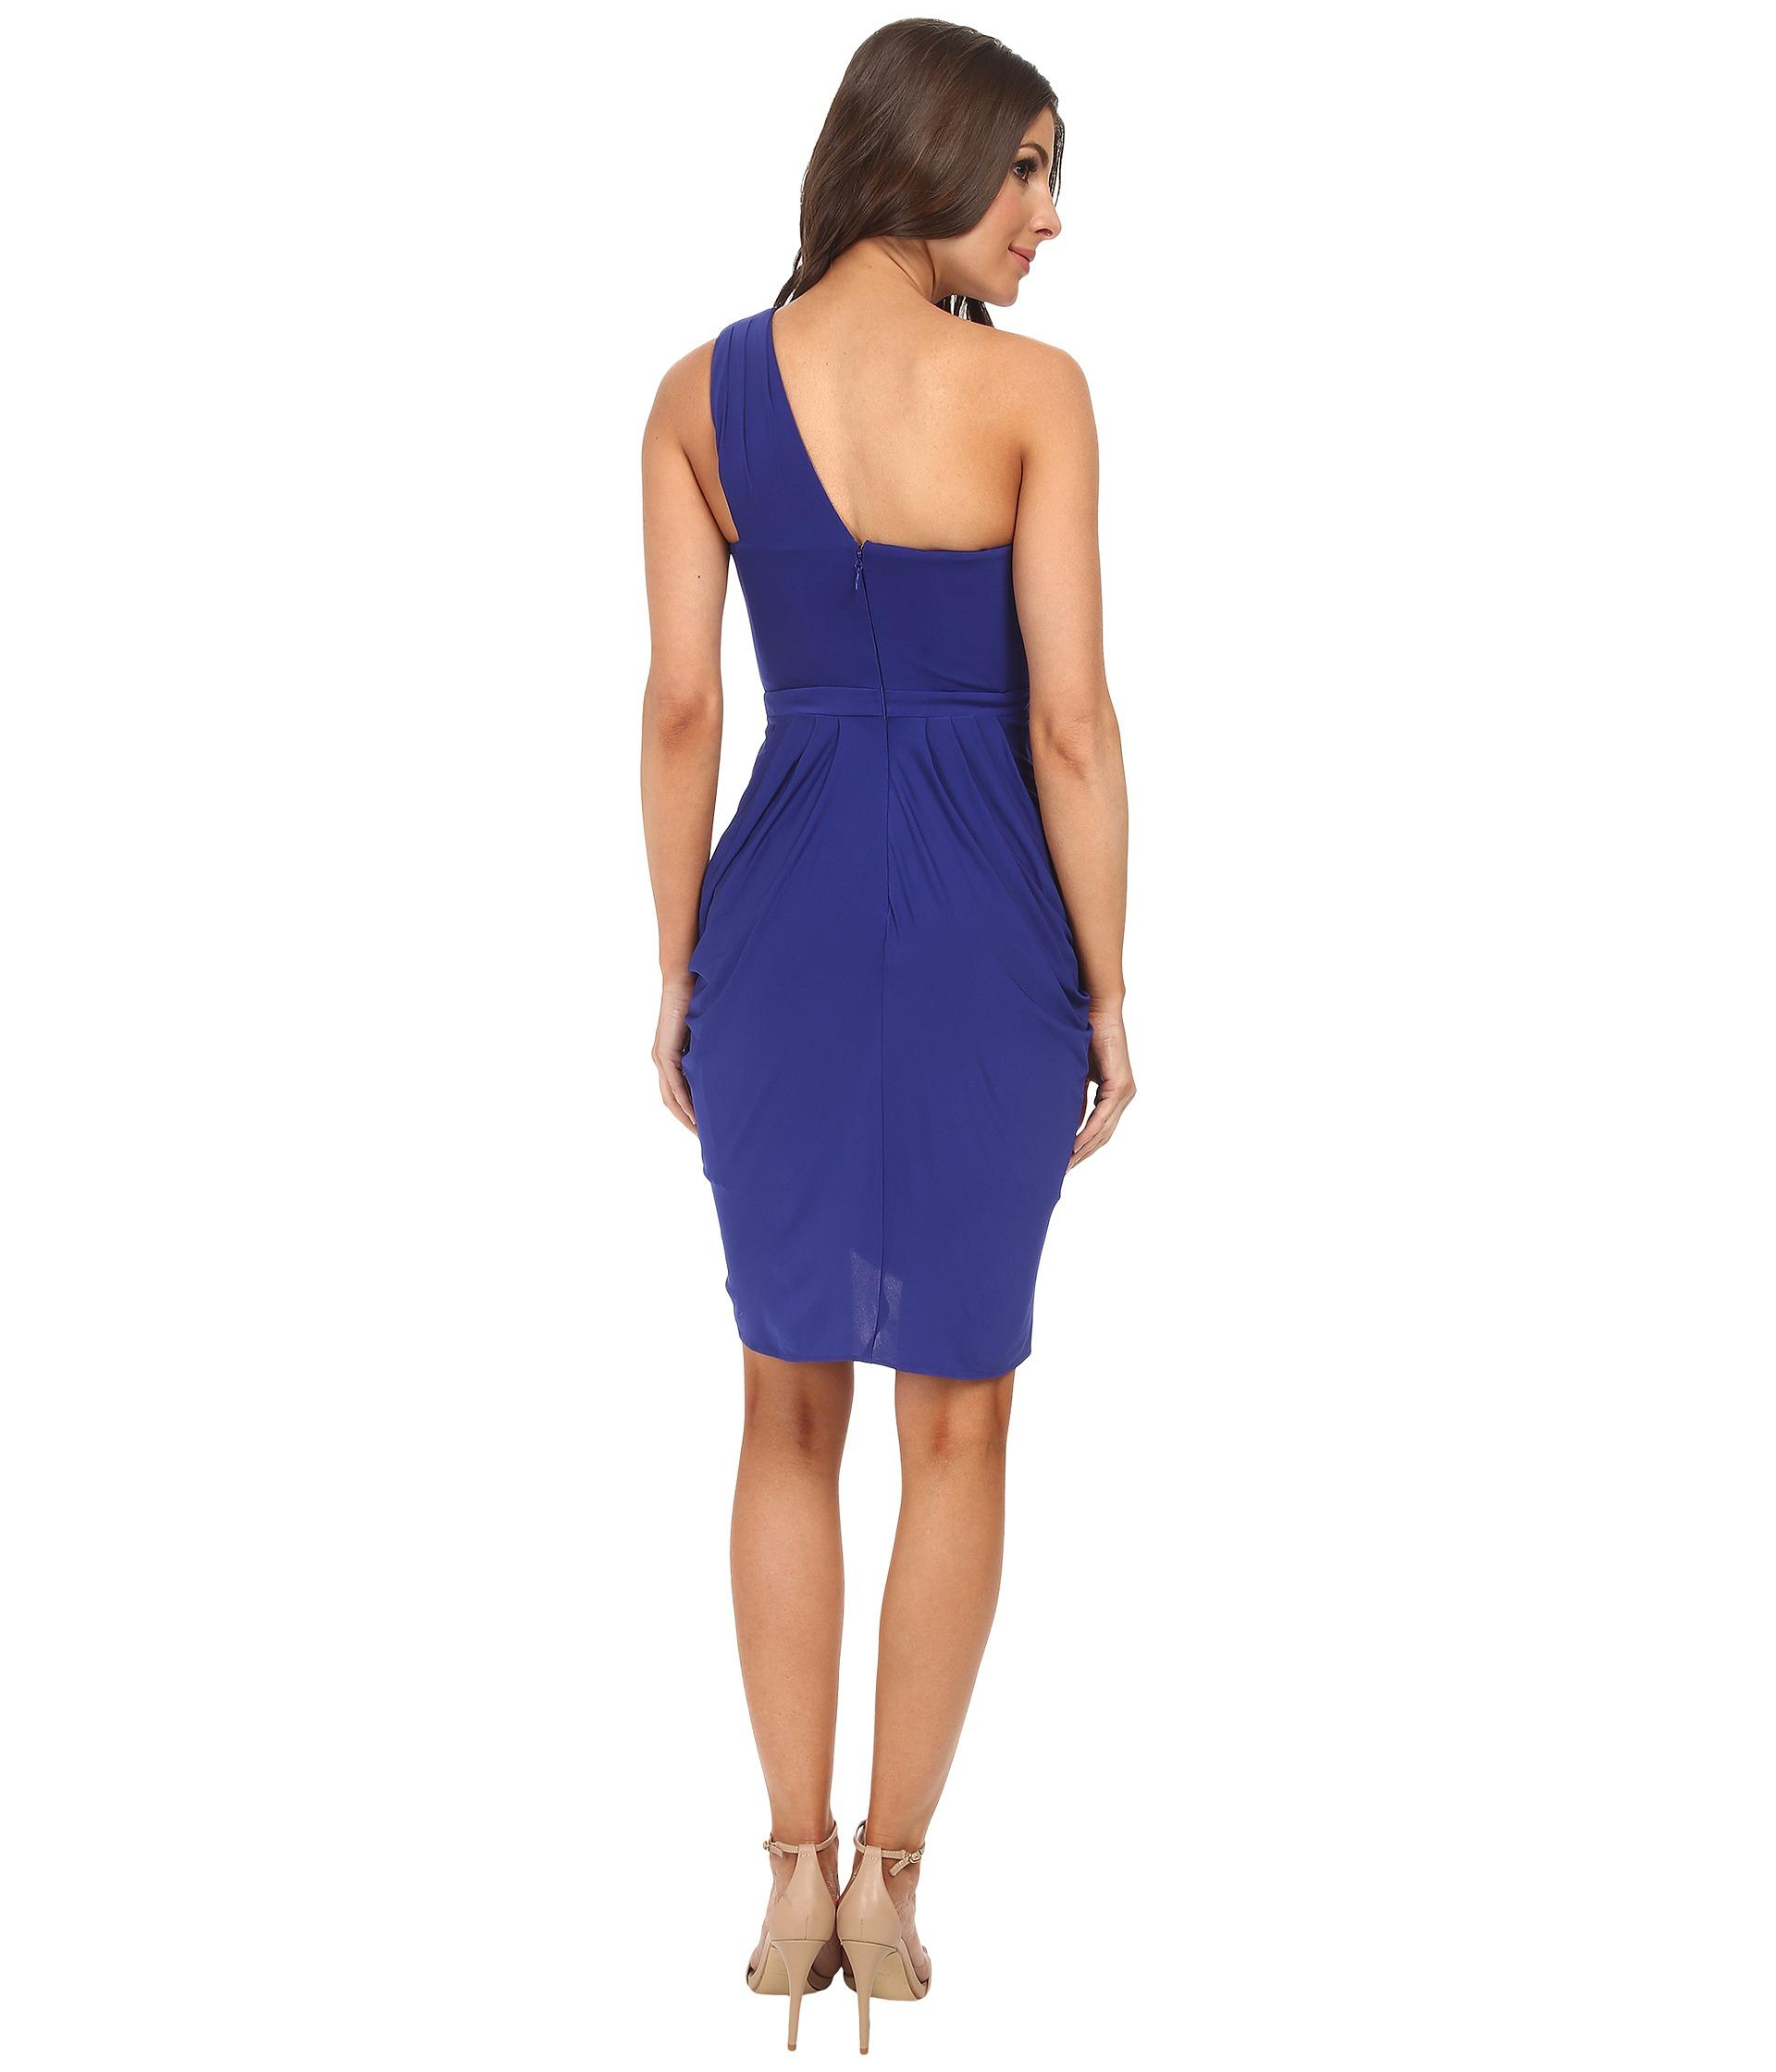 fb3206854ae BCBGMAXAZRIA Julieta One Shoulder Dress in Blue - Lyst